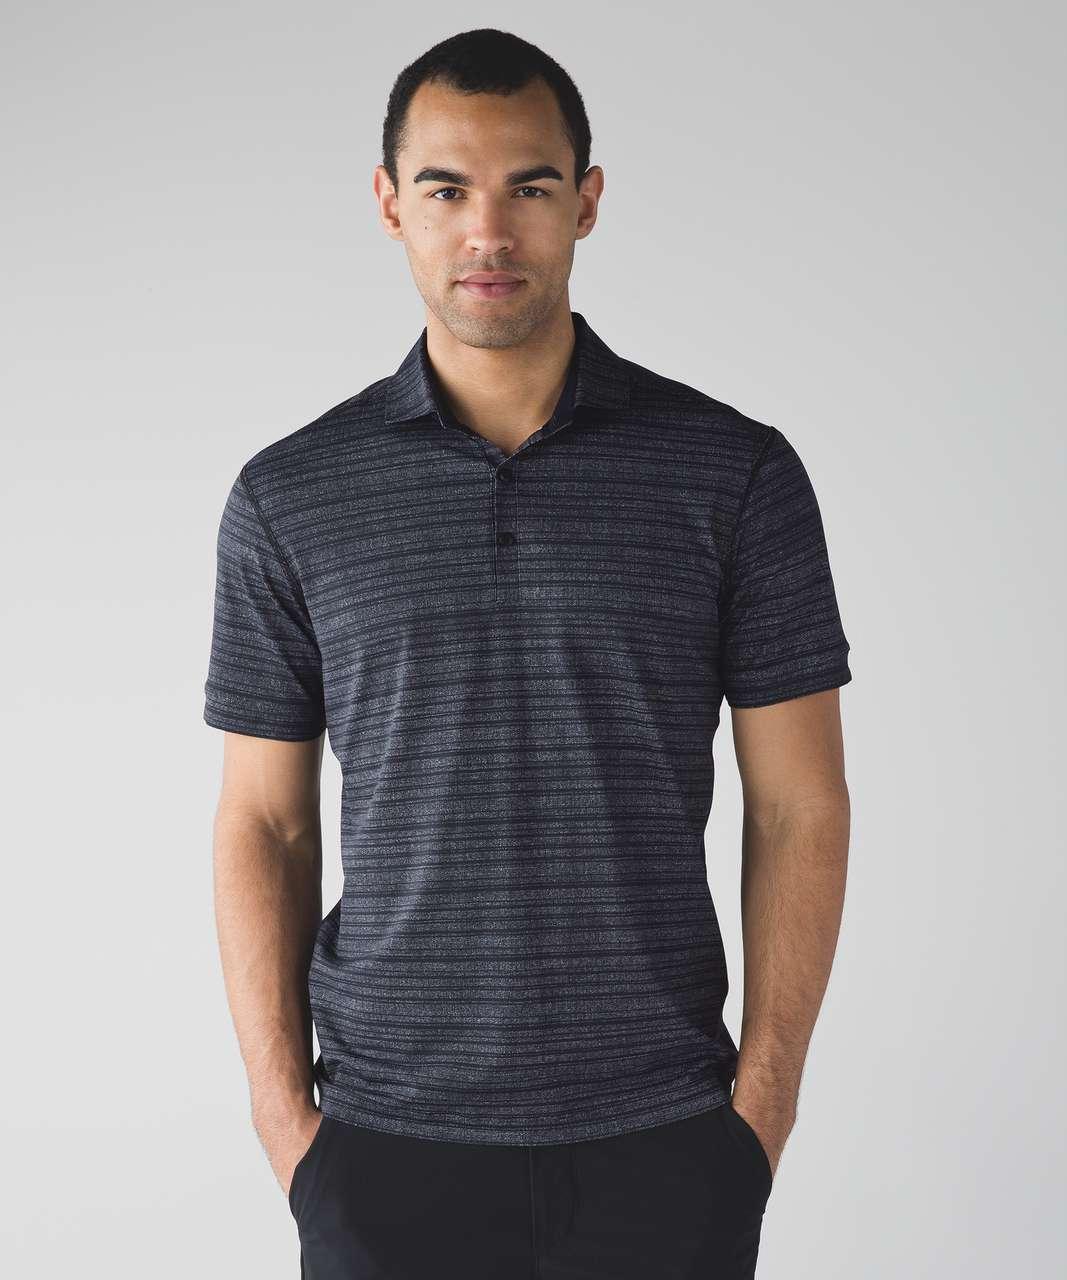 Lululemon Propel Polo - Cut Back Stripe Linen White Black